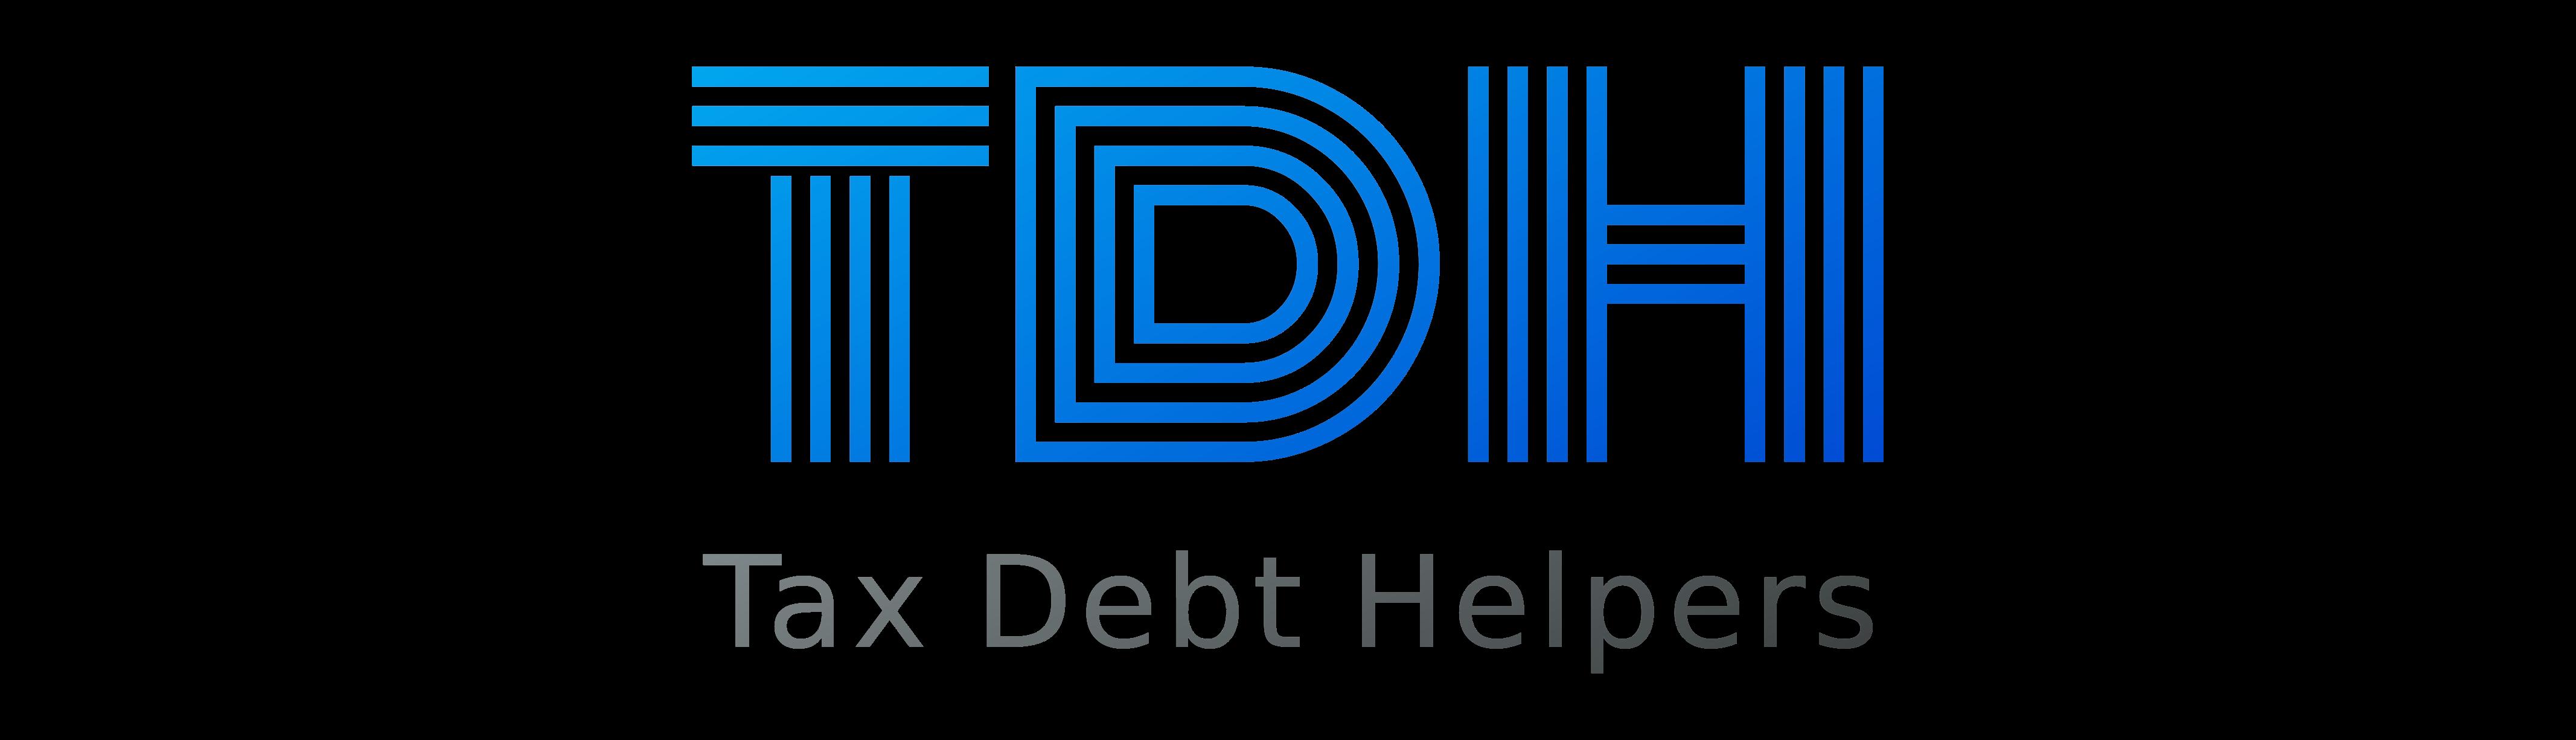 Tax Debt Helpers